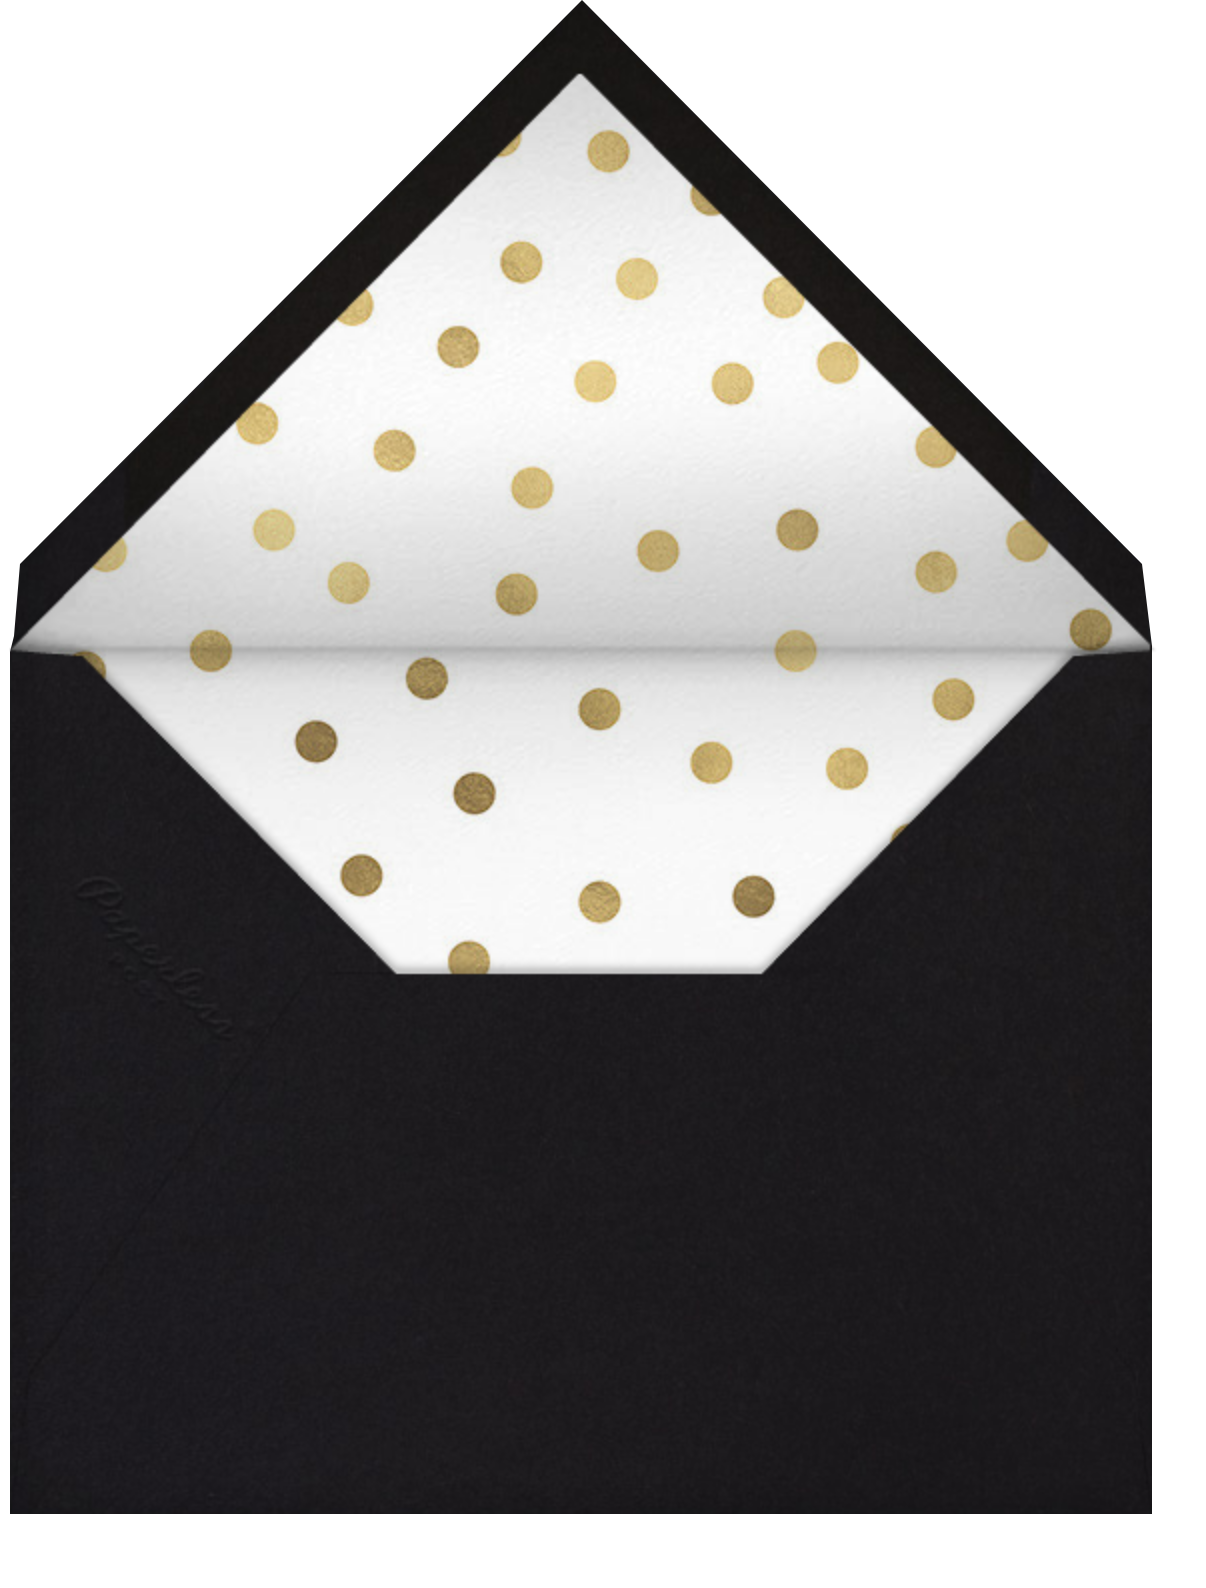 2021 Scene - Cheree Berry - New Year's Eve - envelope back